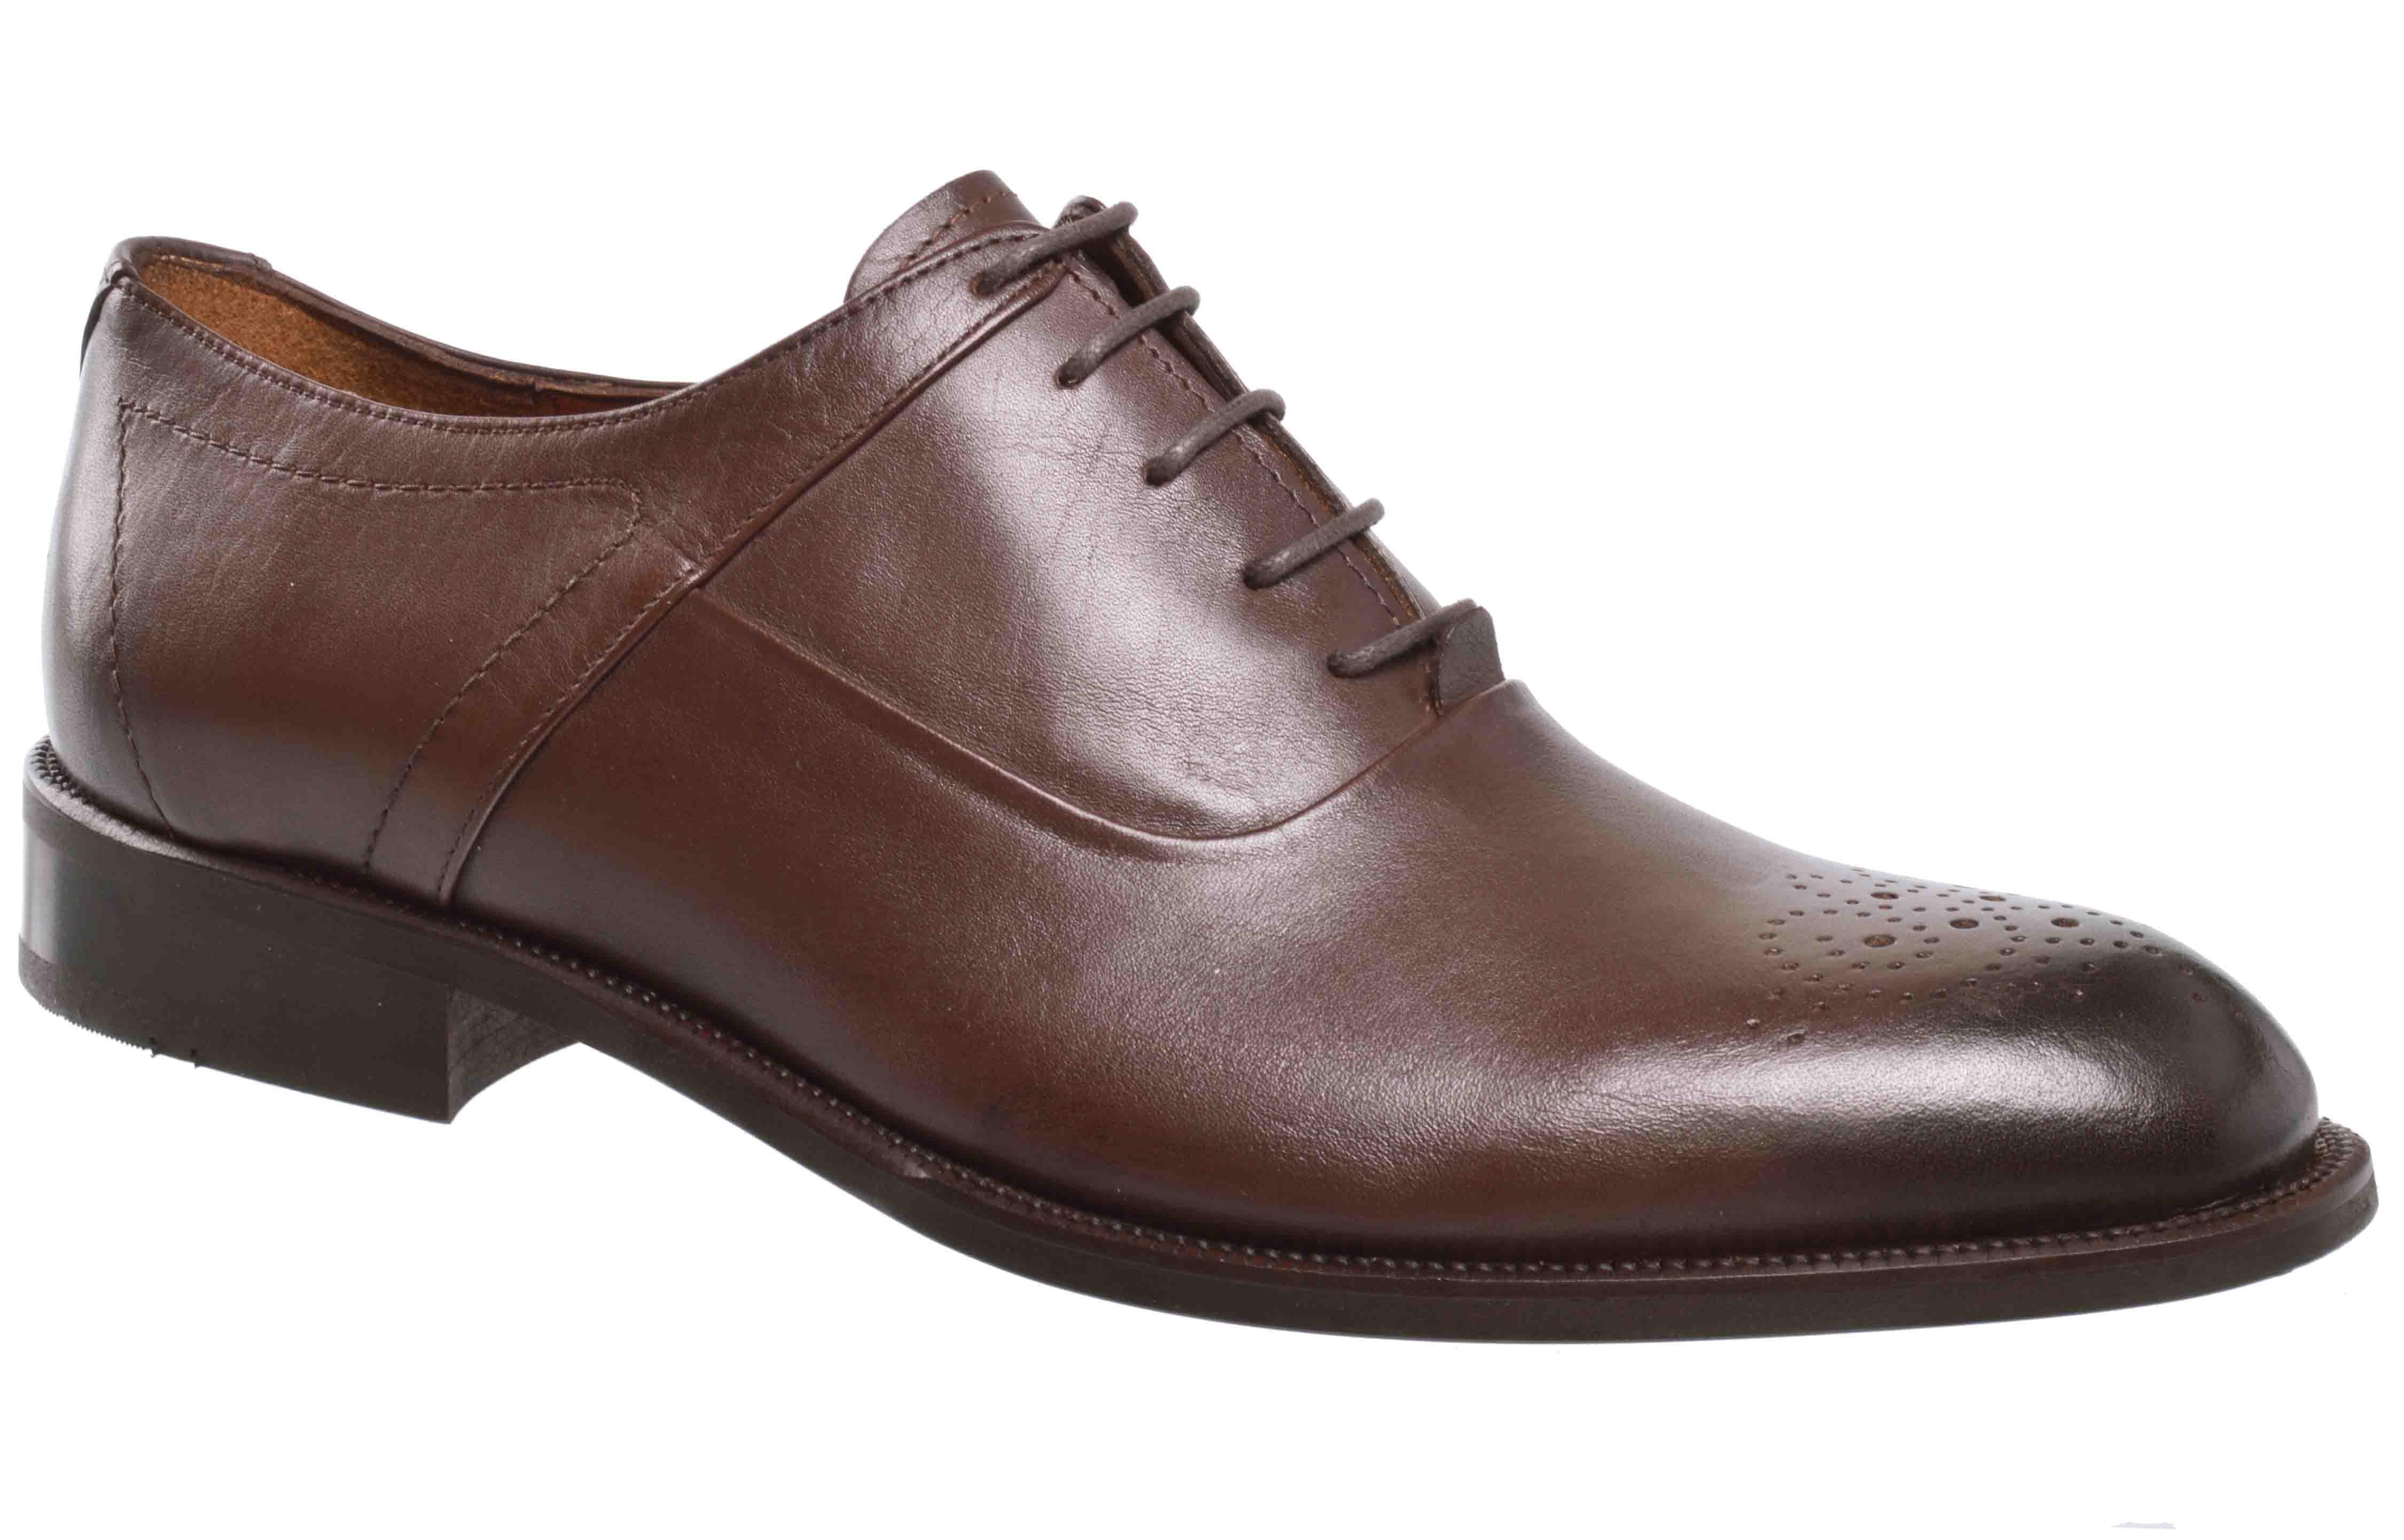 1acd0487d1d Franco Fellini 3202 Καφε | Apostolidis Shoes